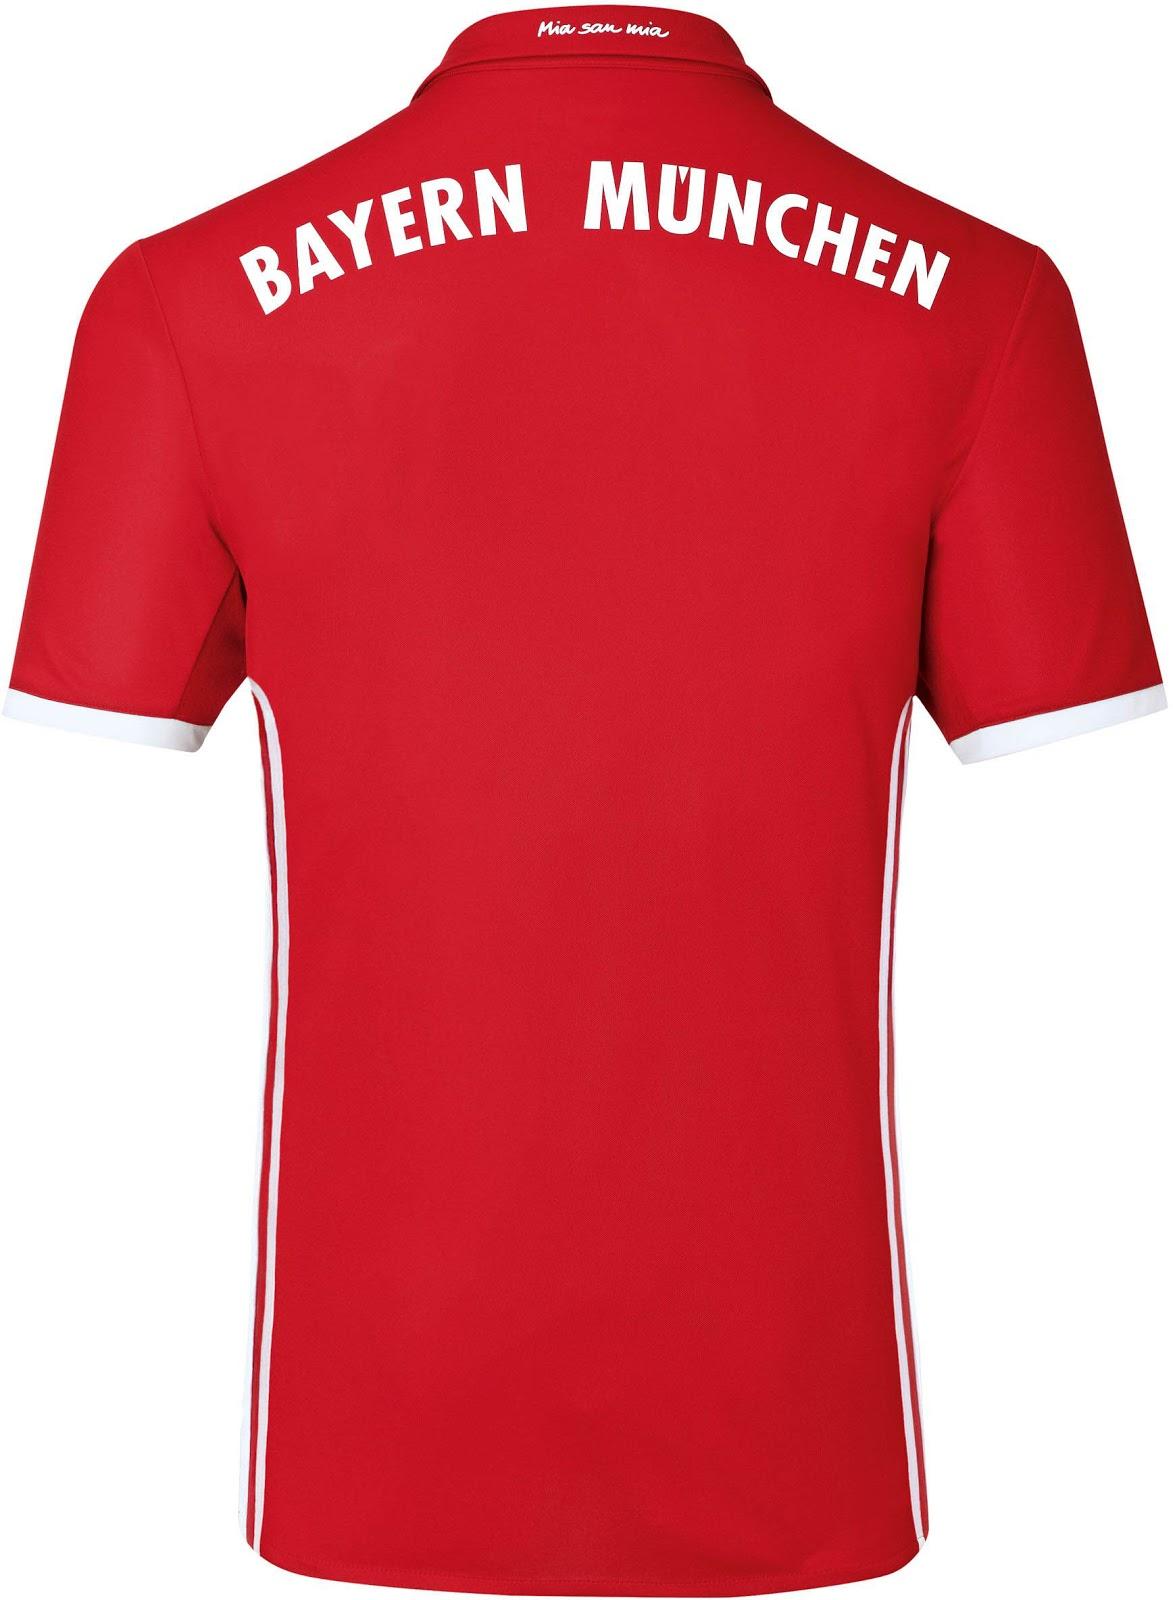 bayern-16-17-kit (6)